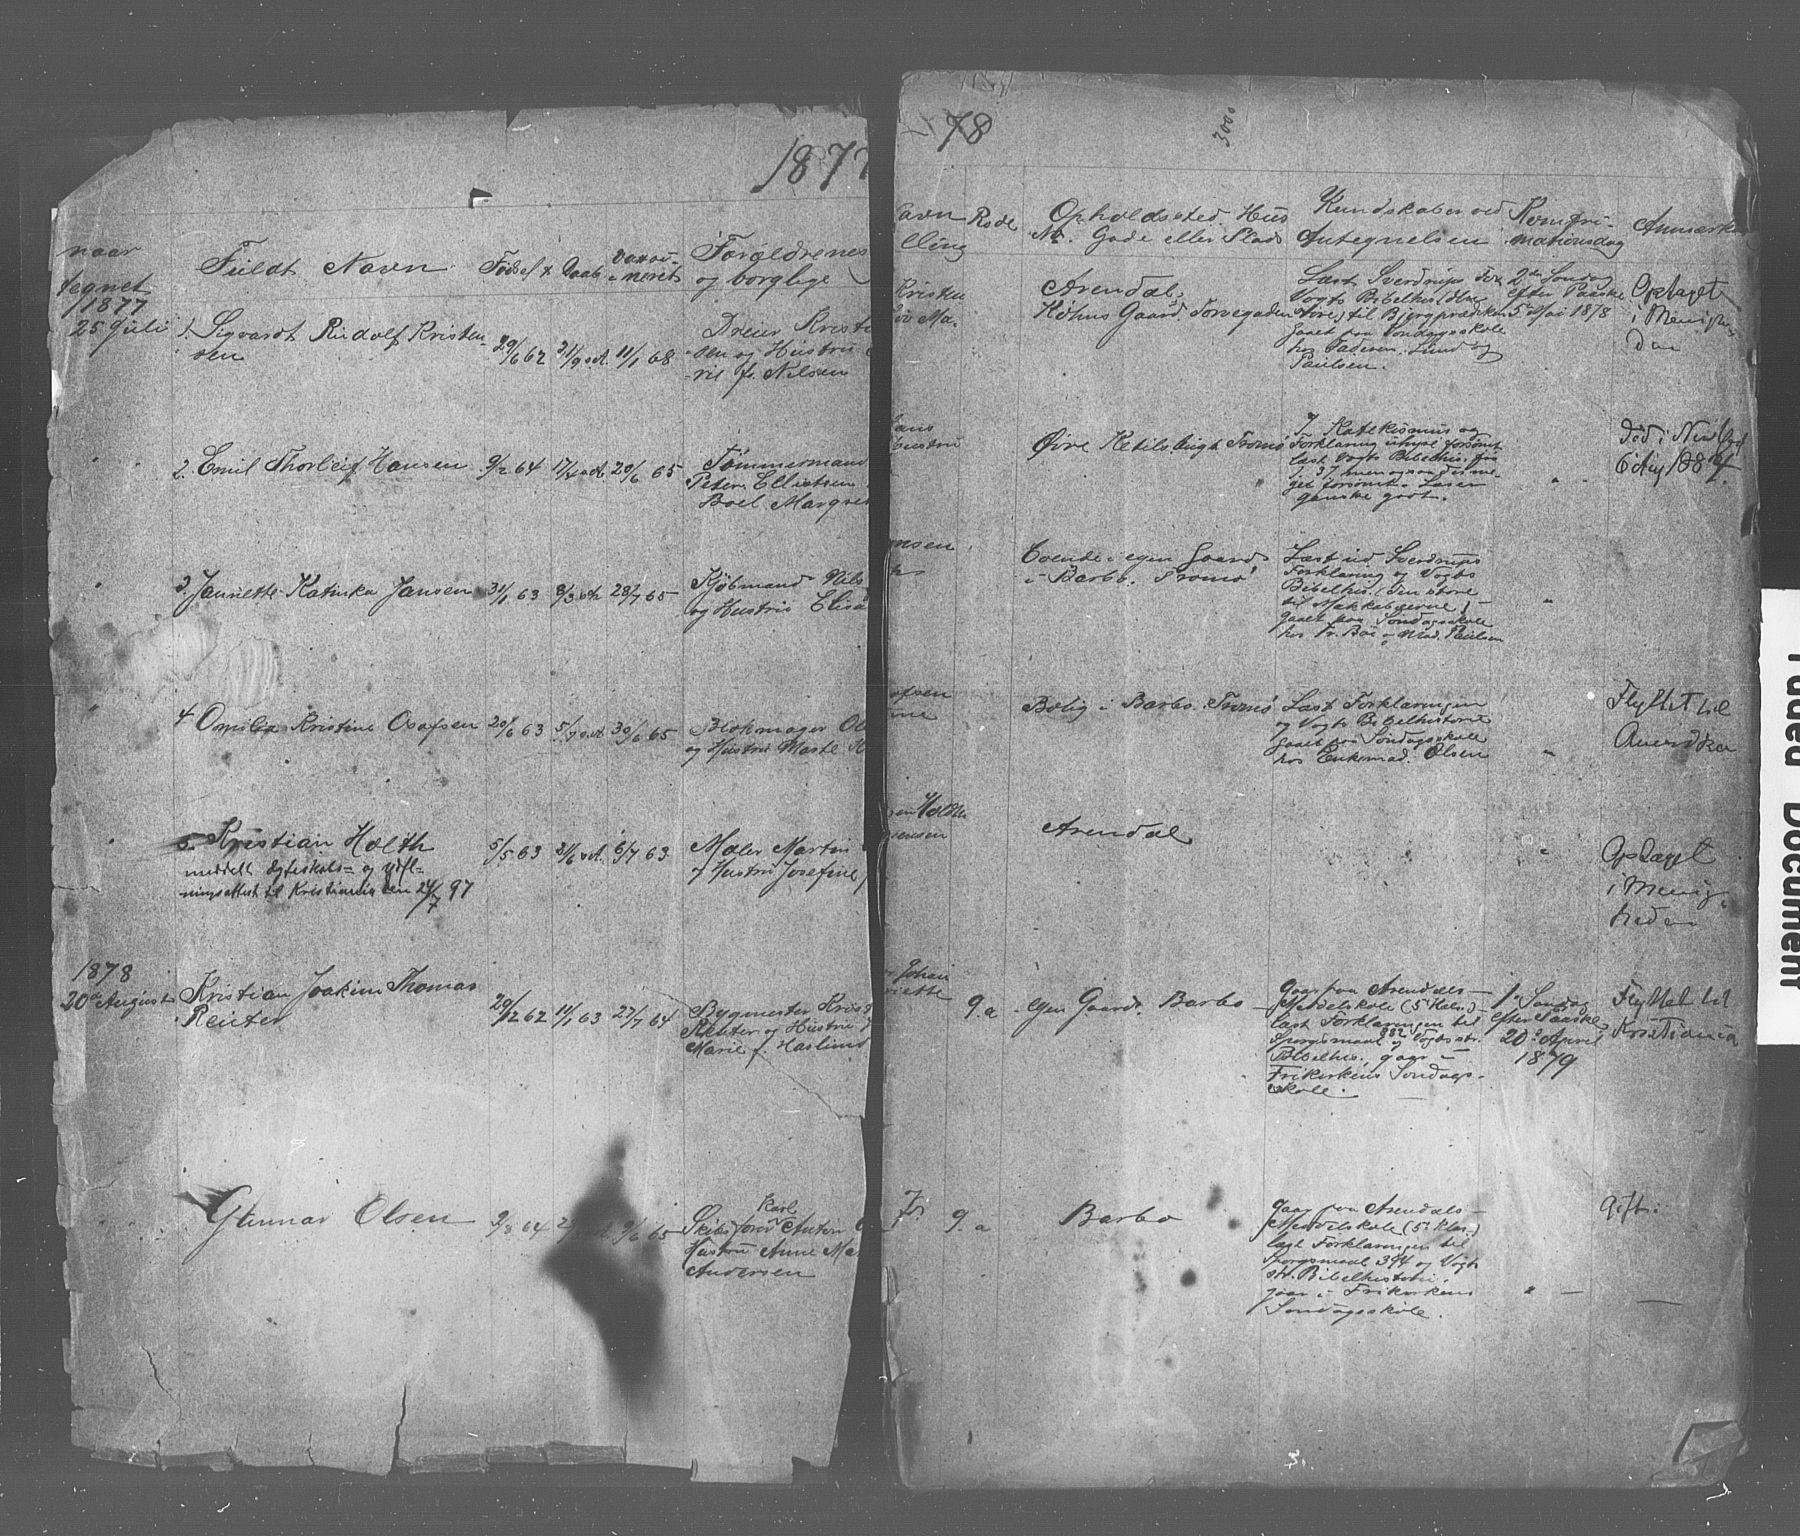 SAK, Den evangelisk-lutherske frimenighet, Arendal, F/Fa/L0001: Dissenterprotokoll nr. F 5, 1877-1883